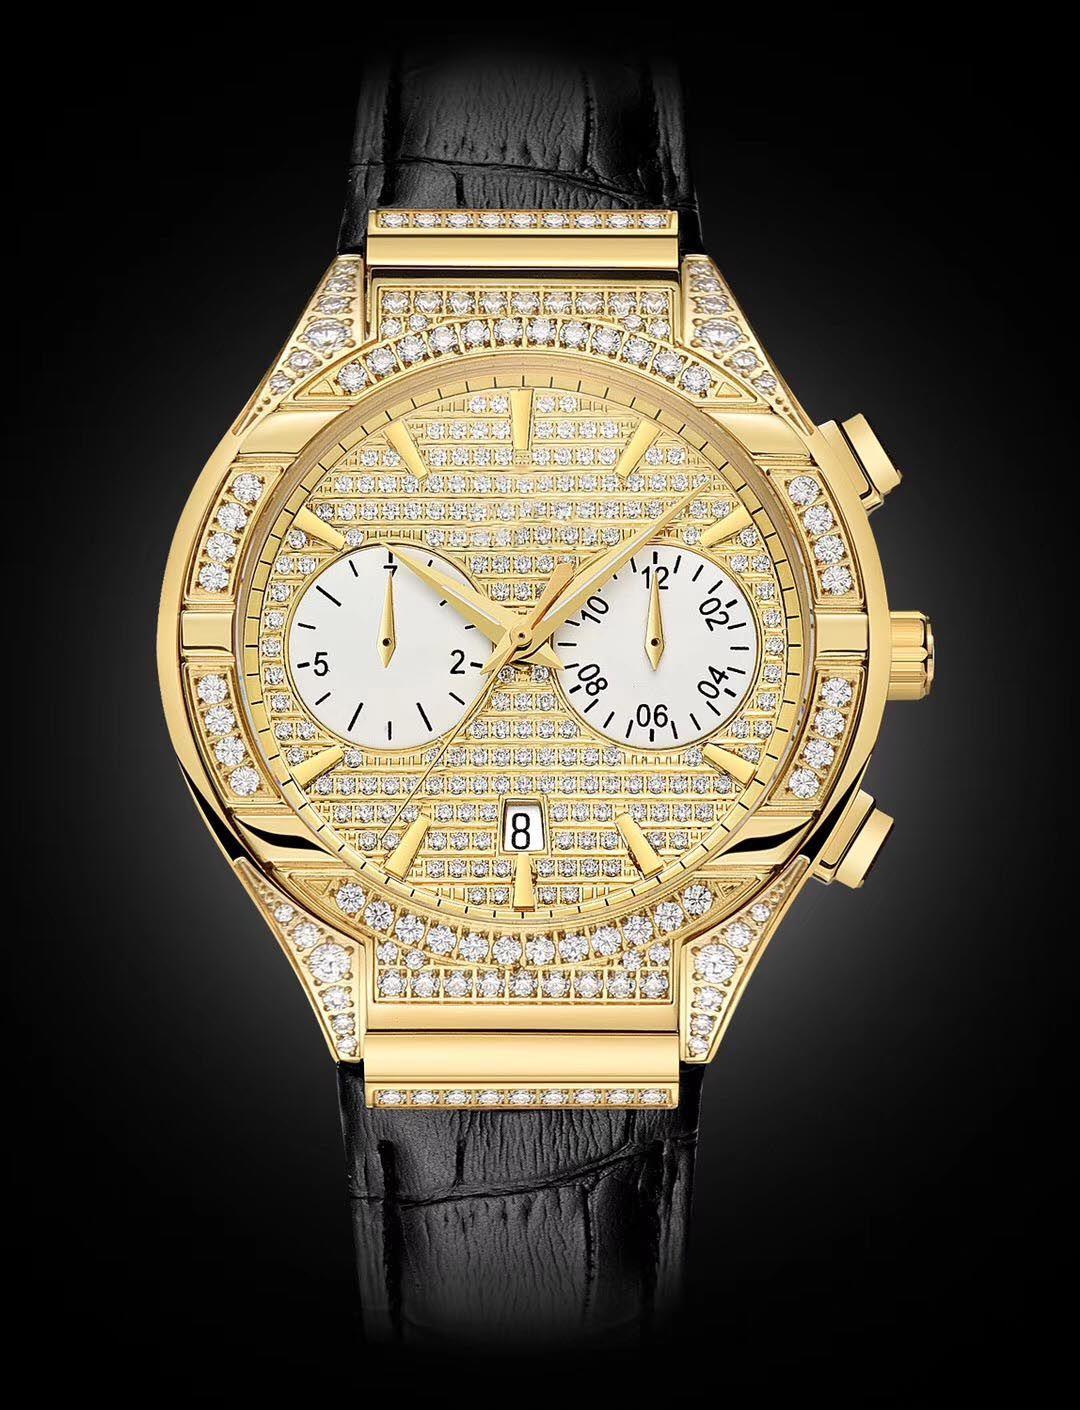 Month Day Man Watch Gold+Diamond 43mm Luxury Real Leather Black Strap Sapphire glass 9100 Automatic Man's WristWatch Waterproof 50mter